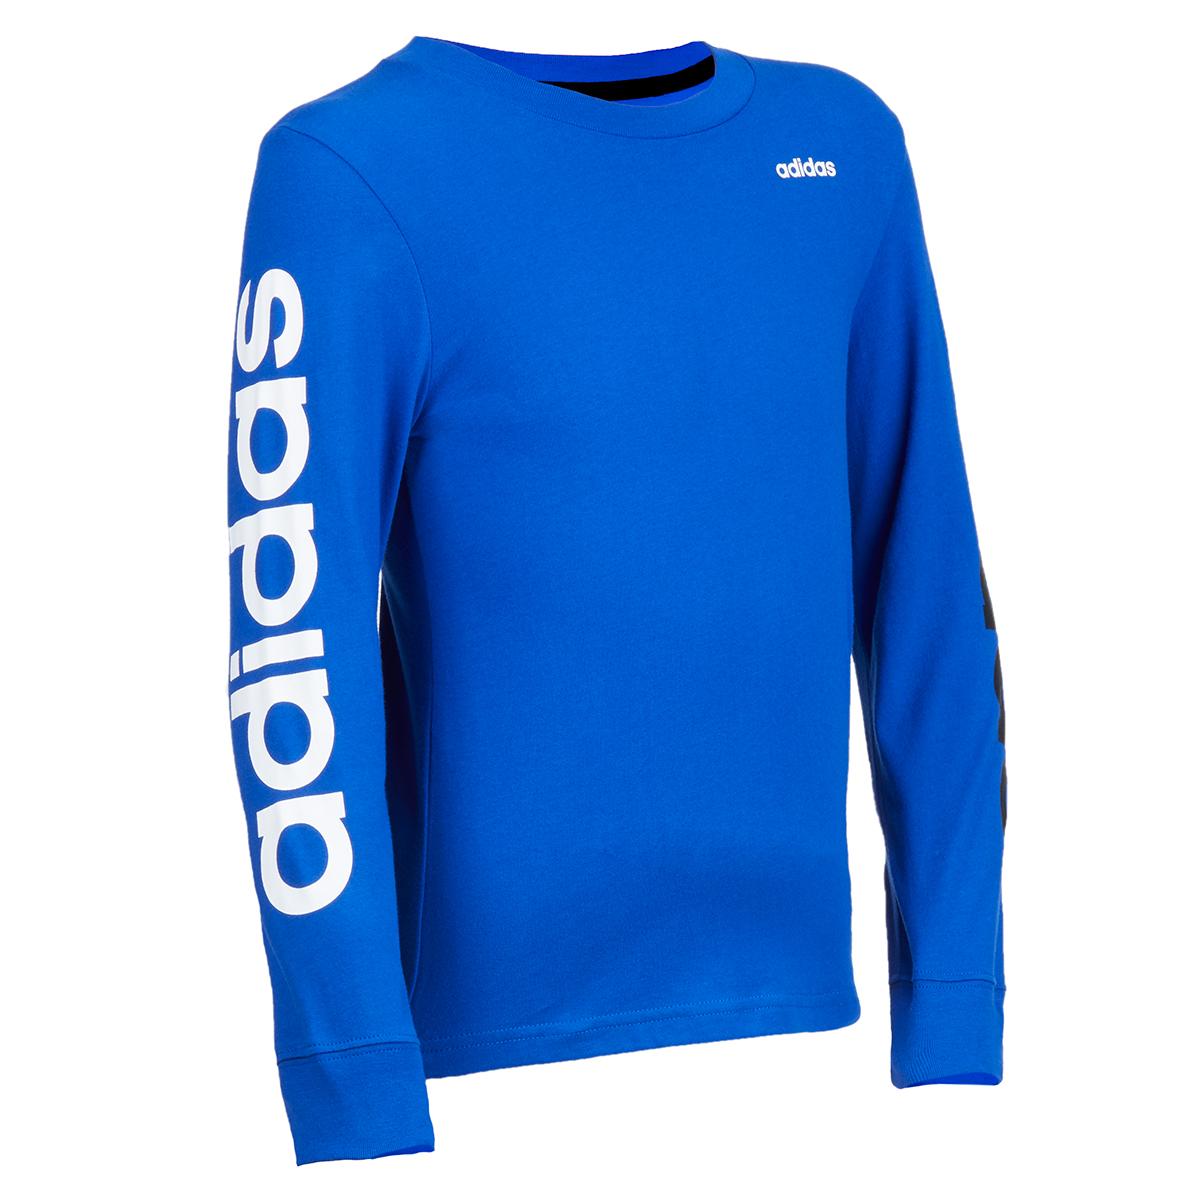 Adidas Little Boy's Long-Sleeve Linear Cotton Tee - Blue, 4